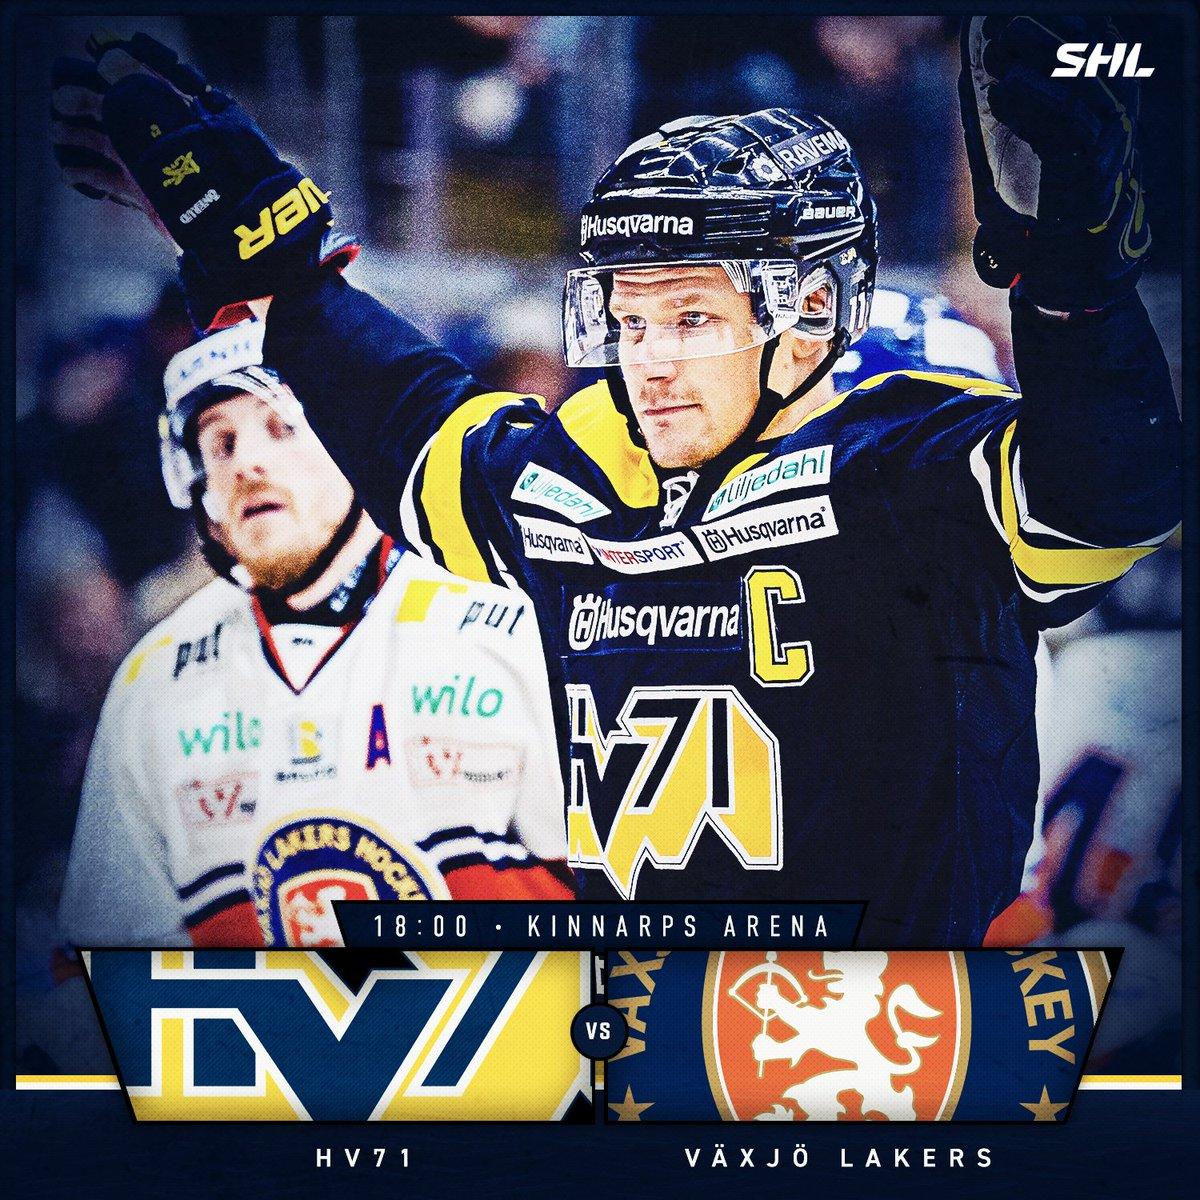 Hv71 On Twitter Gameday Vaxjolakers 18 00 Kinnarps Arena Https T Co 6w7yznuo2s Hv71